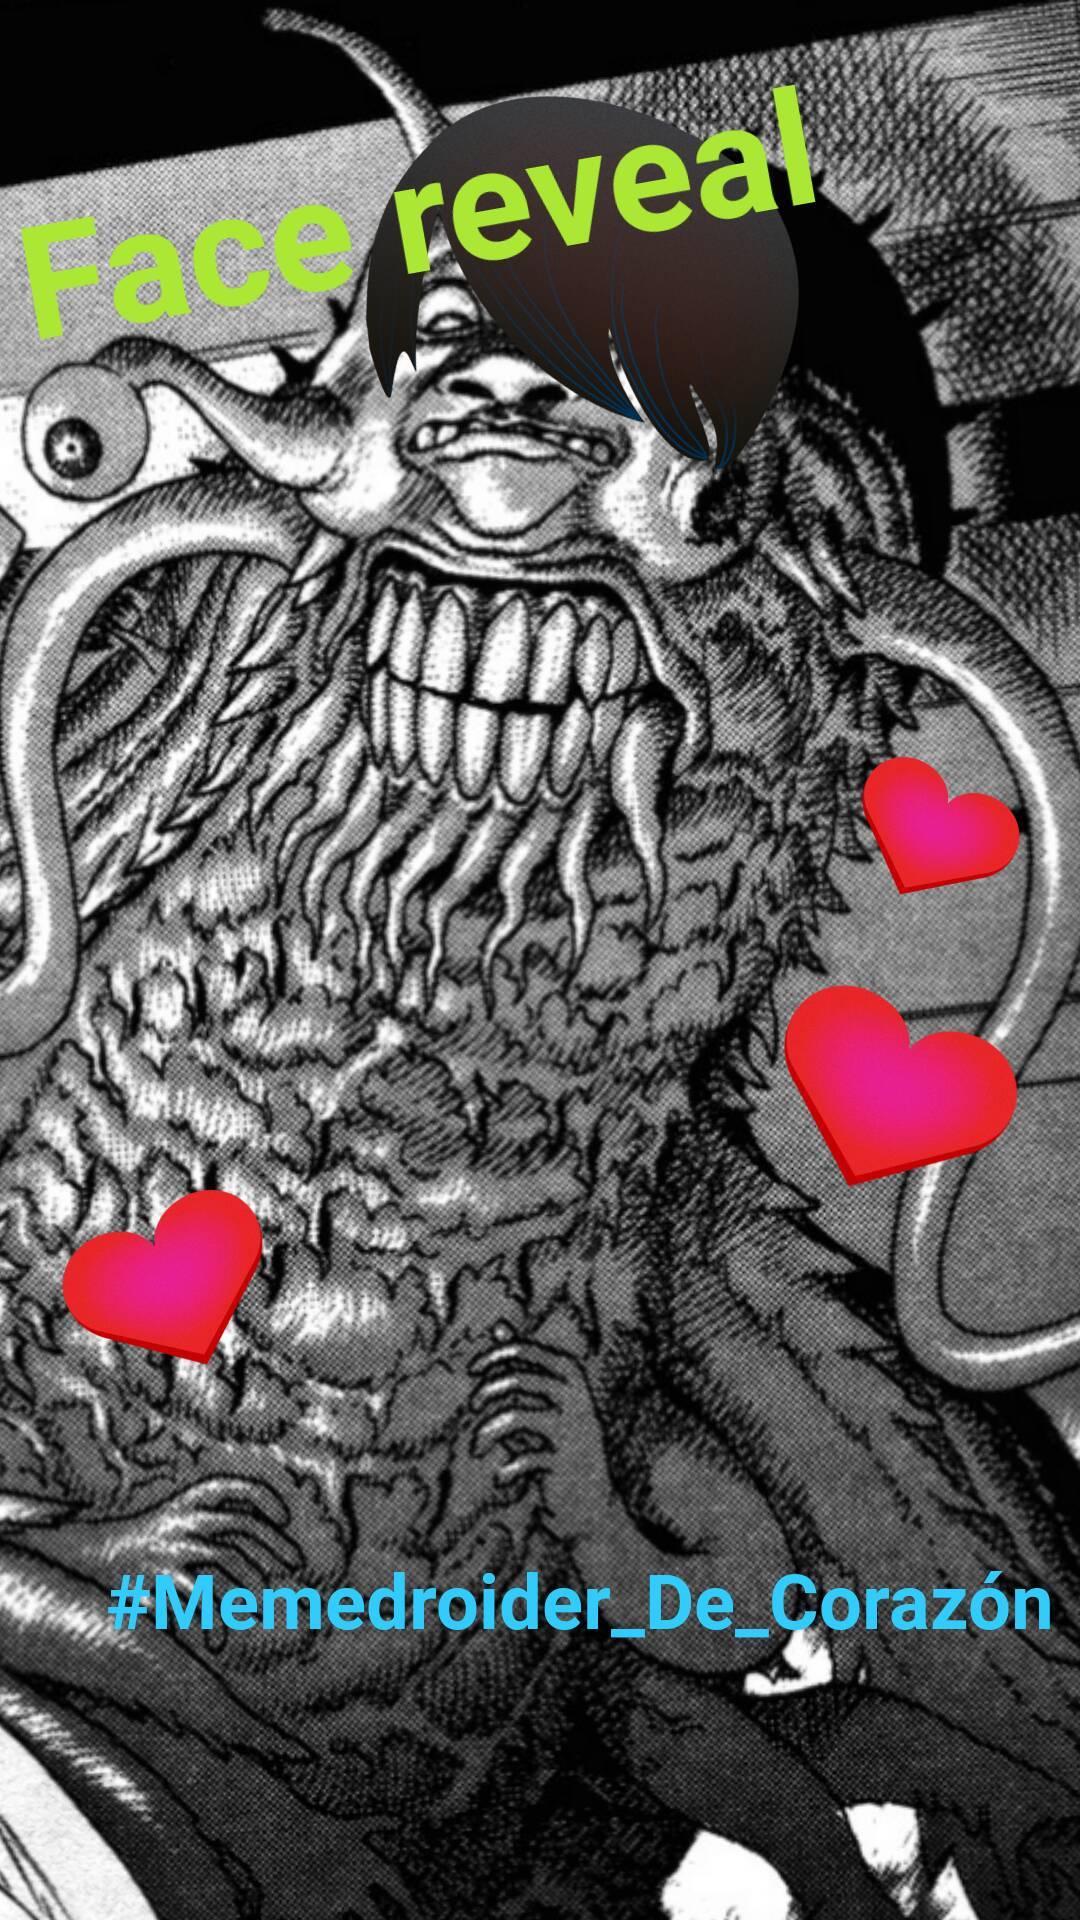 Memedroider de corazón